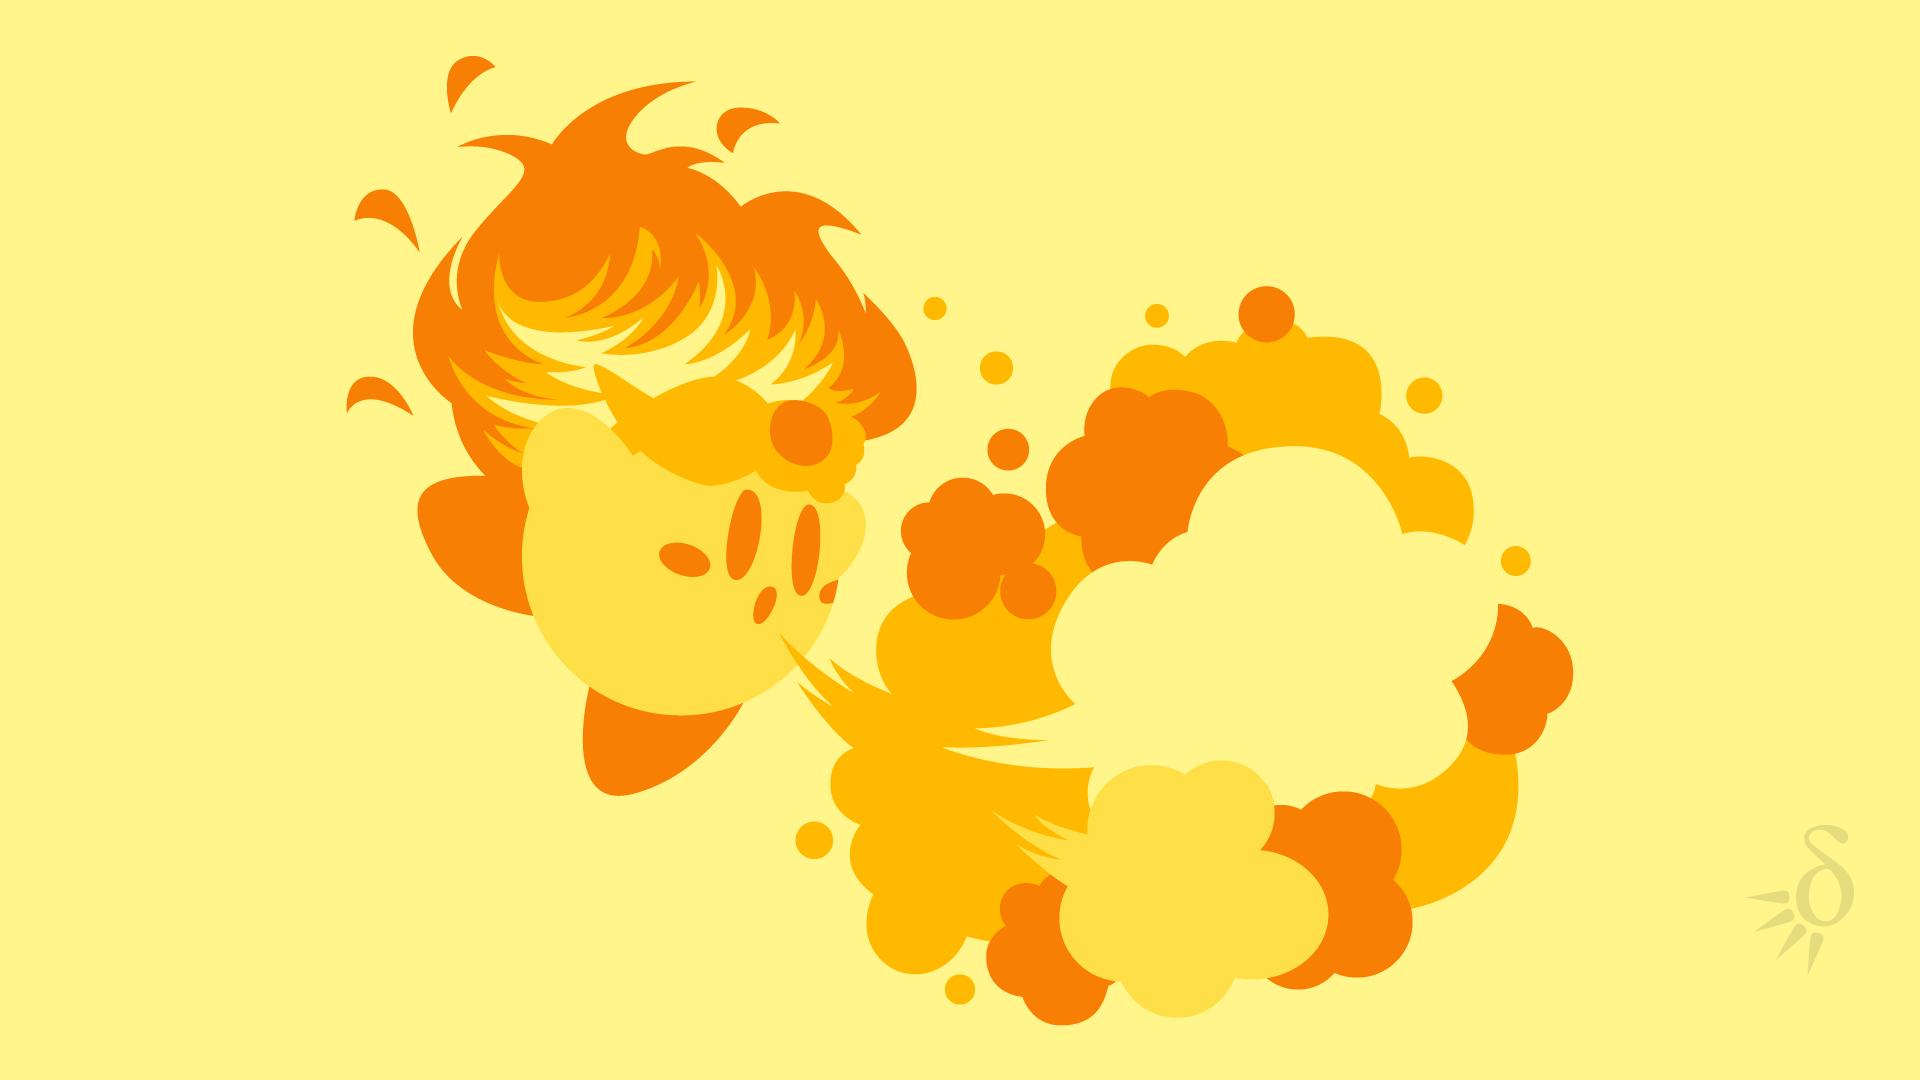 Fire Kirby By Krukmeister On Deviantart